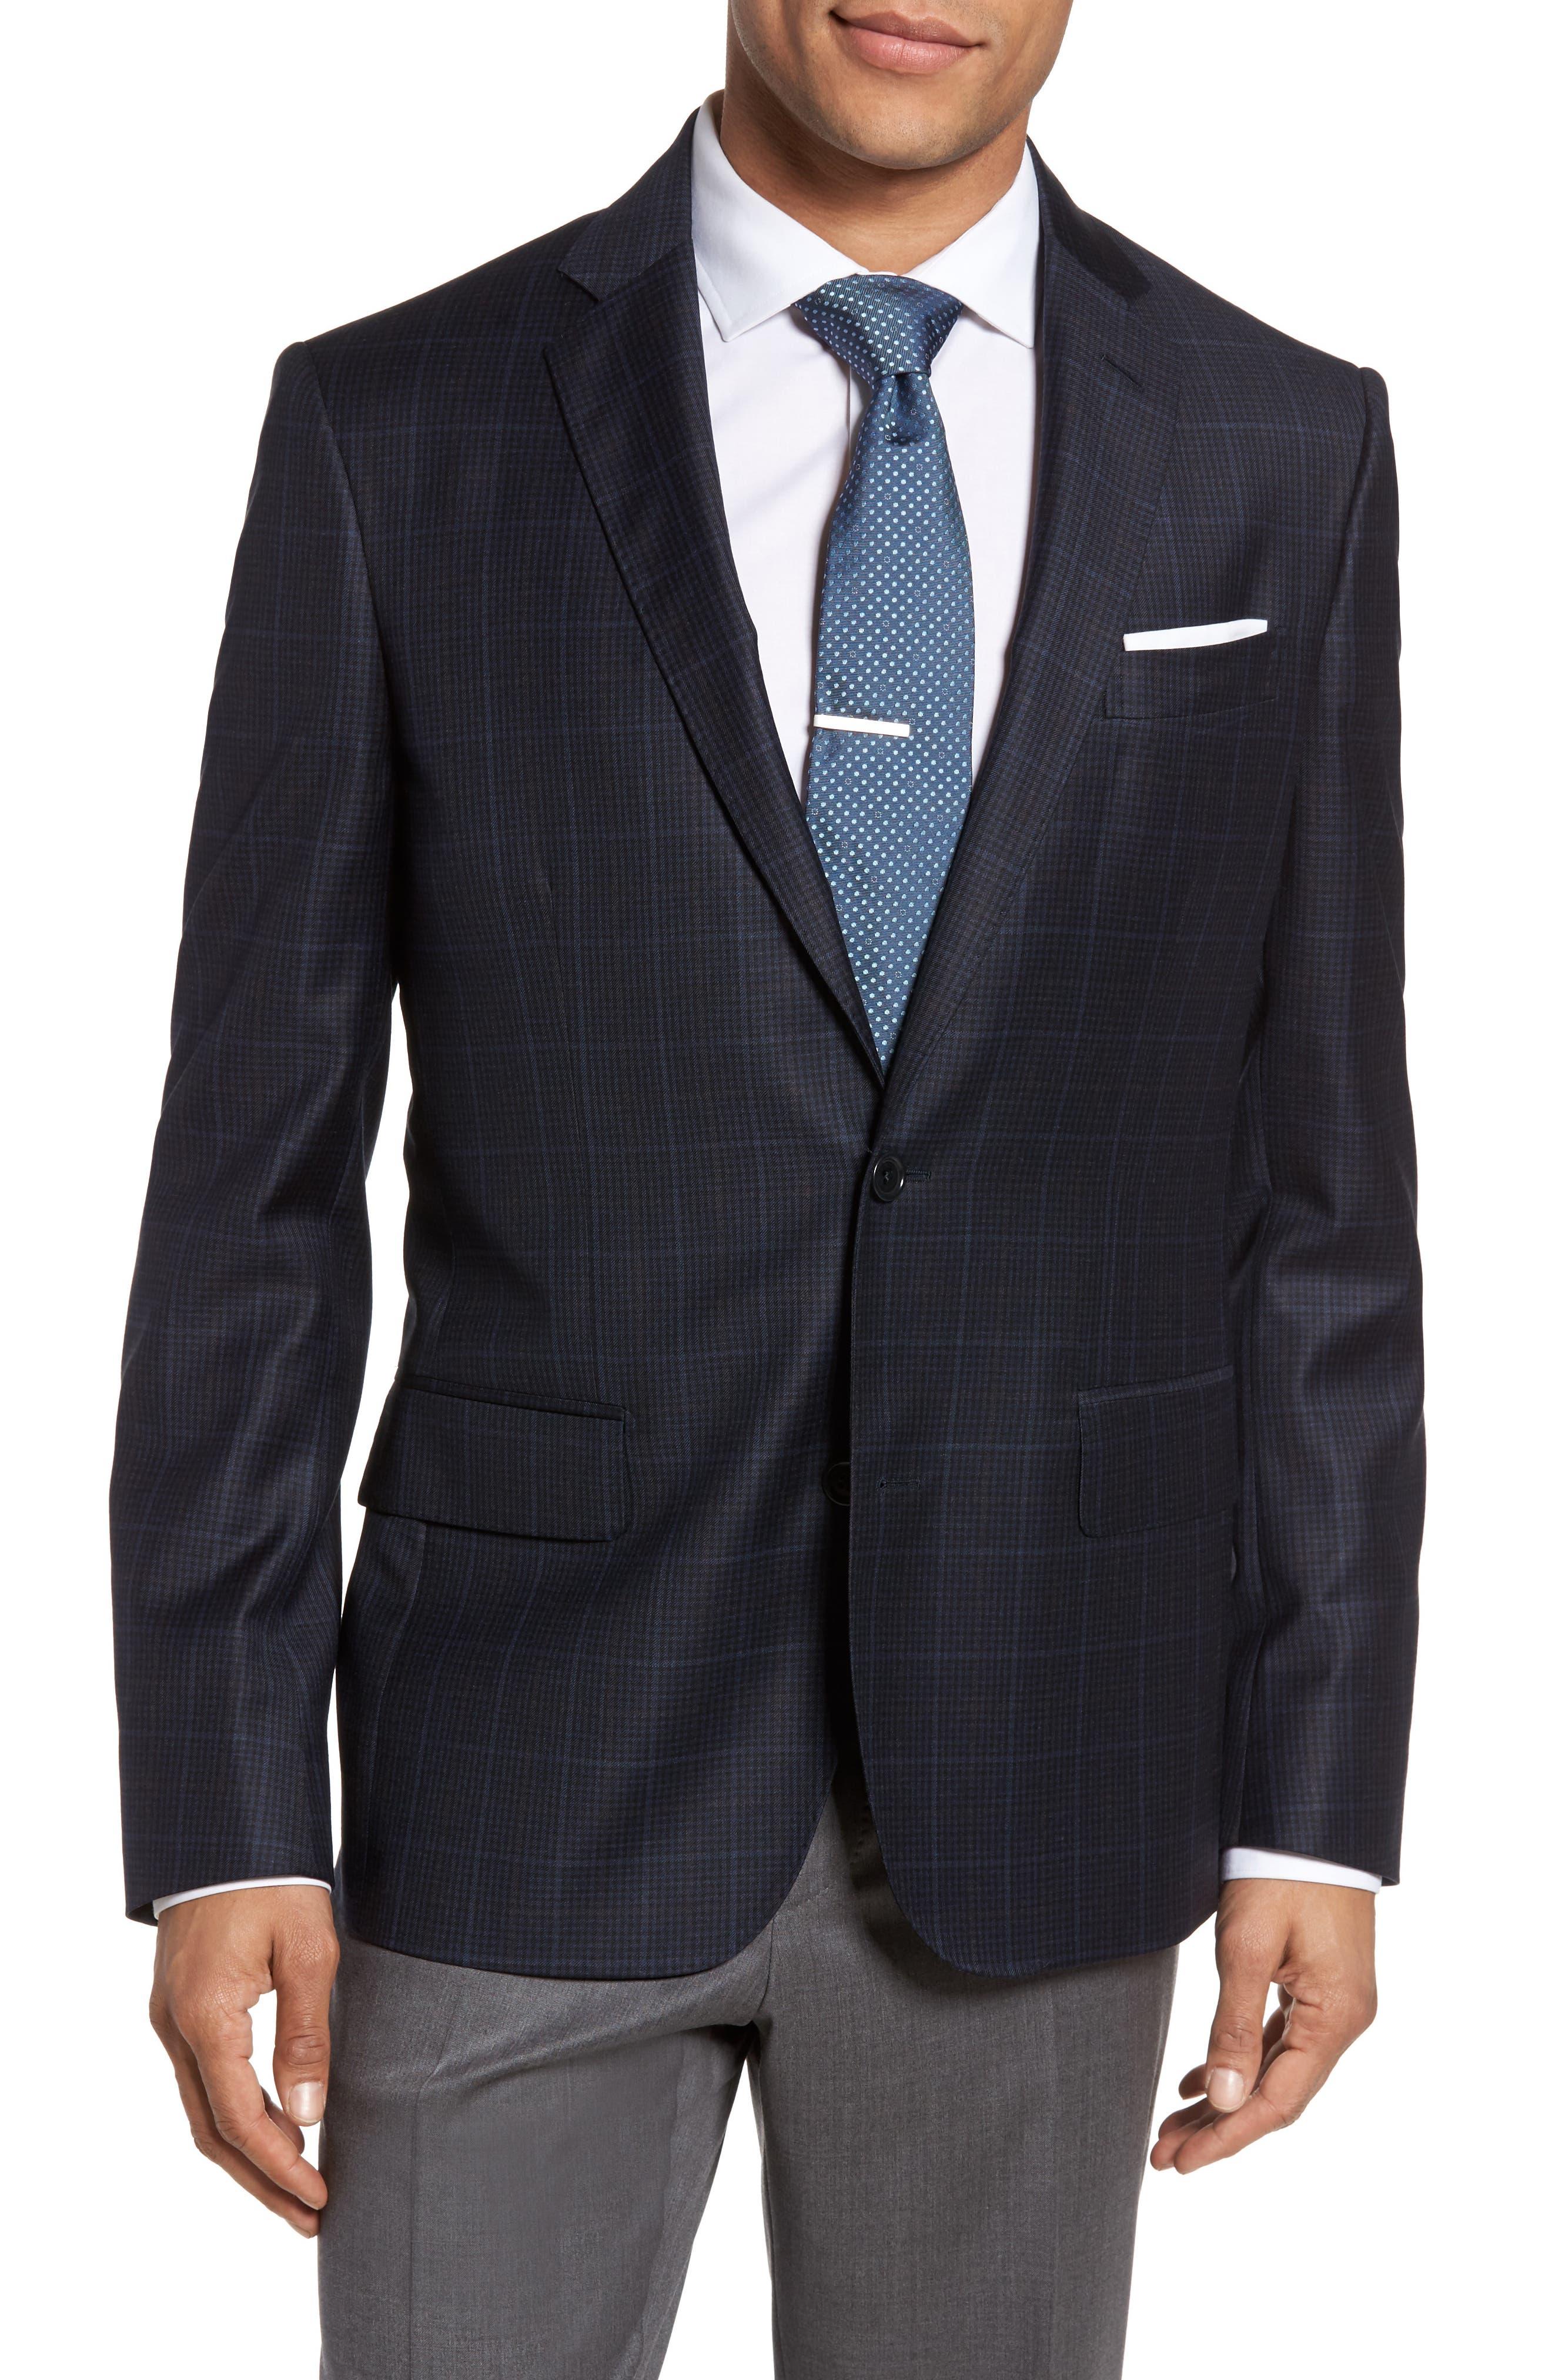 Main Image - Nordstrom Men's Shop Classic Fit Plaid Wool Sport Coat